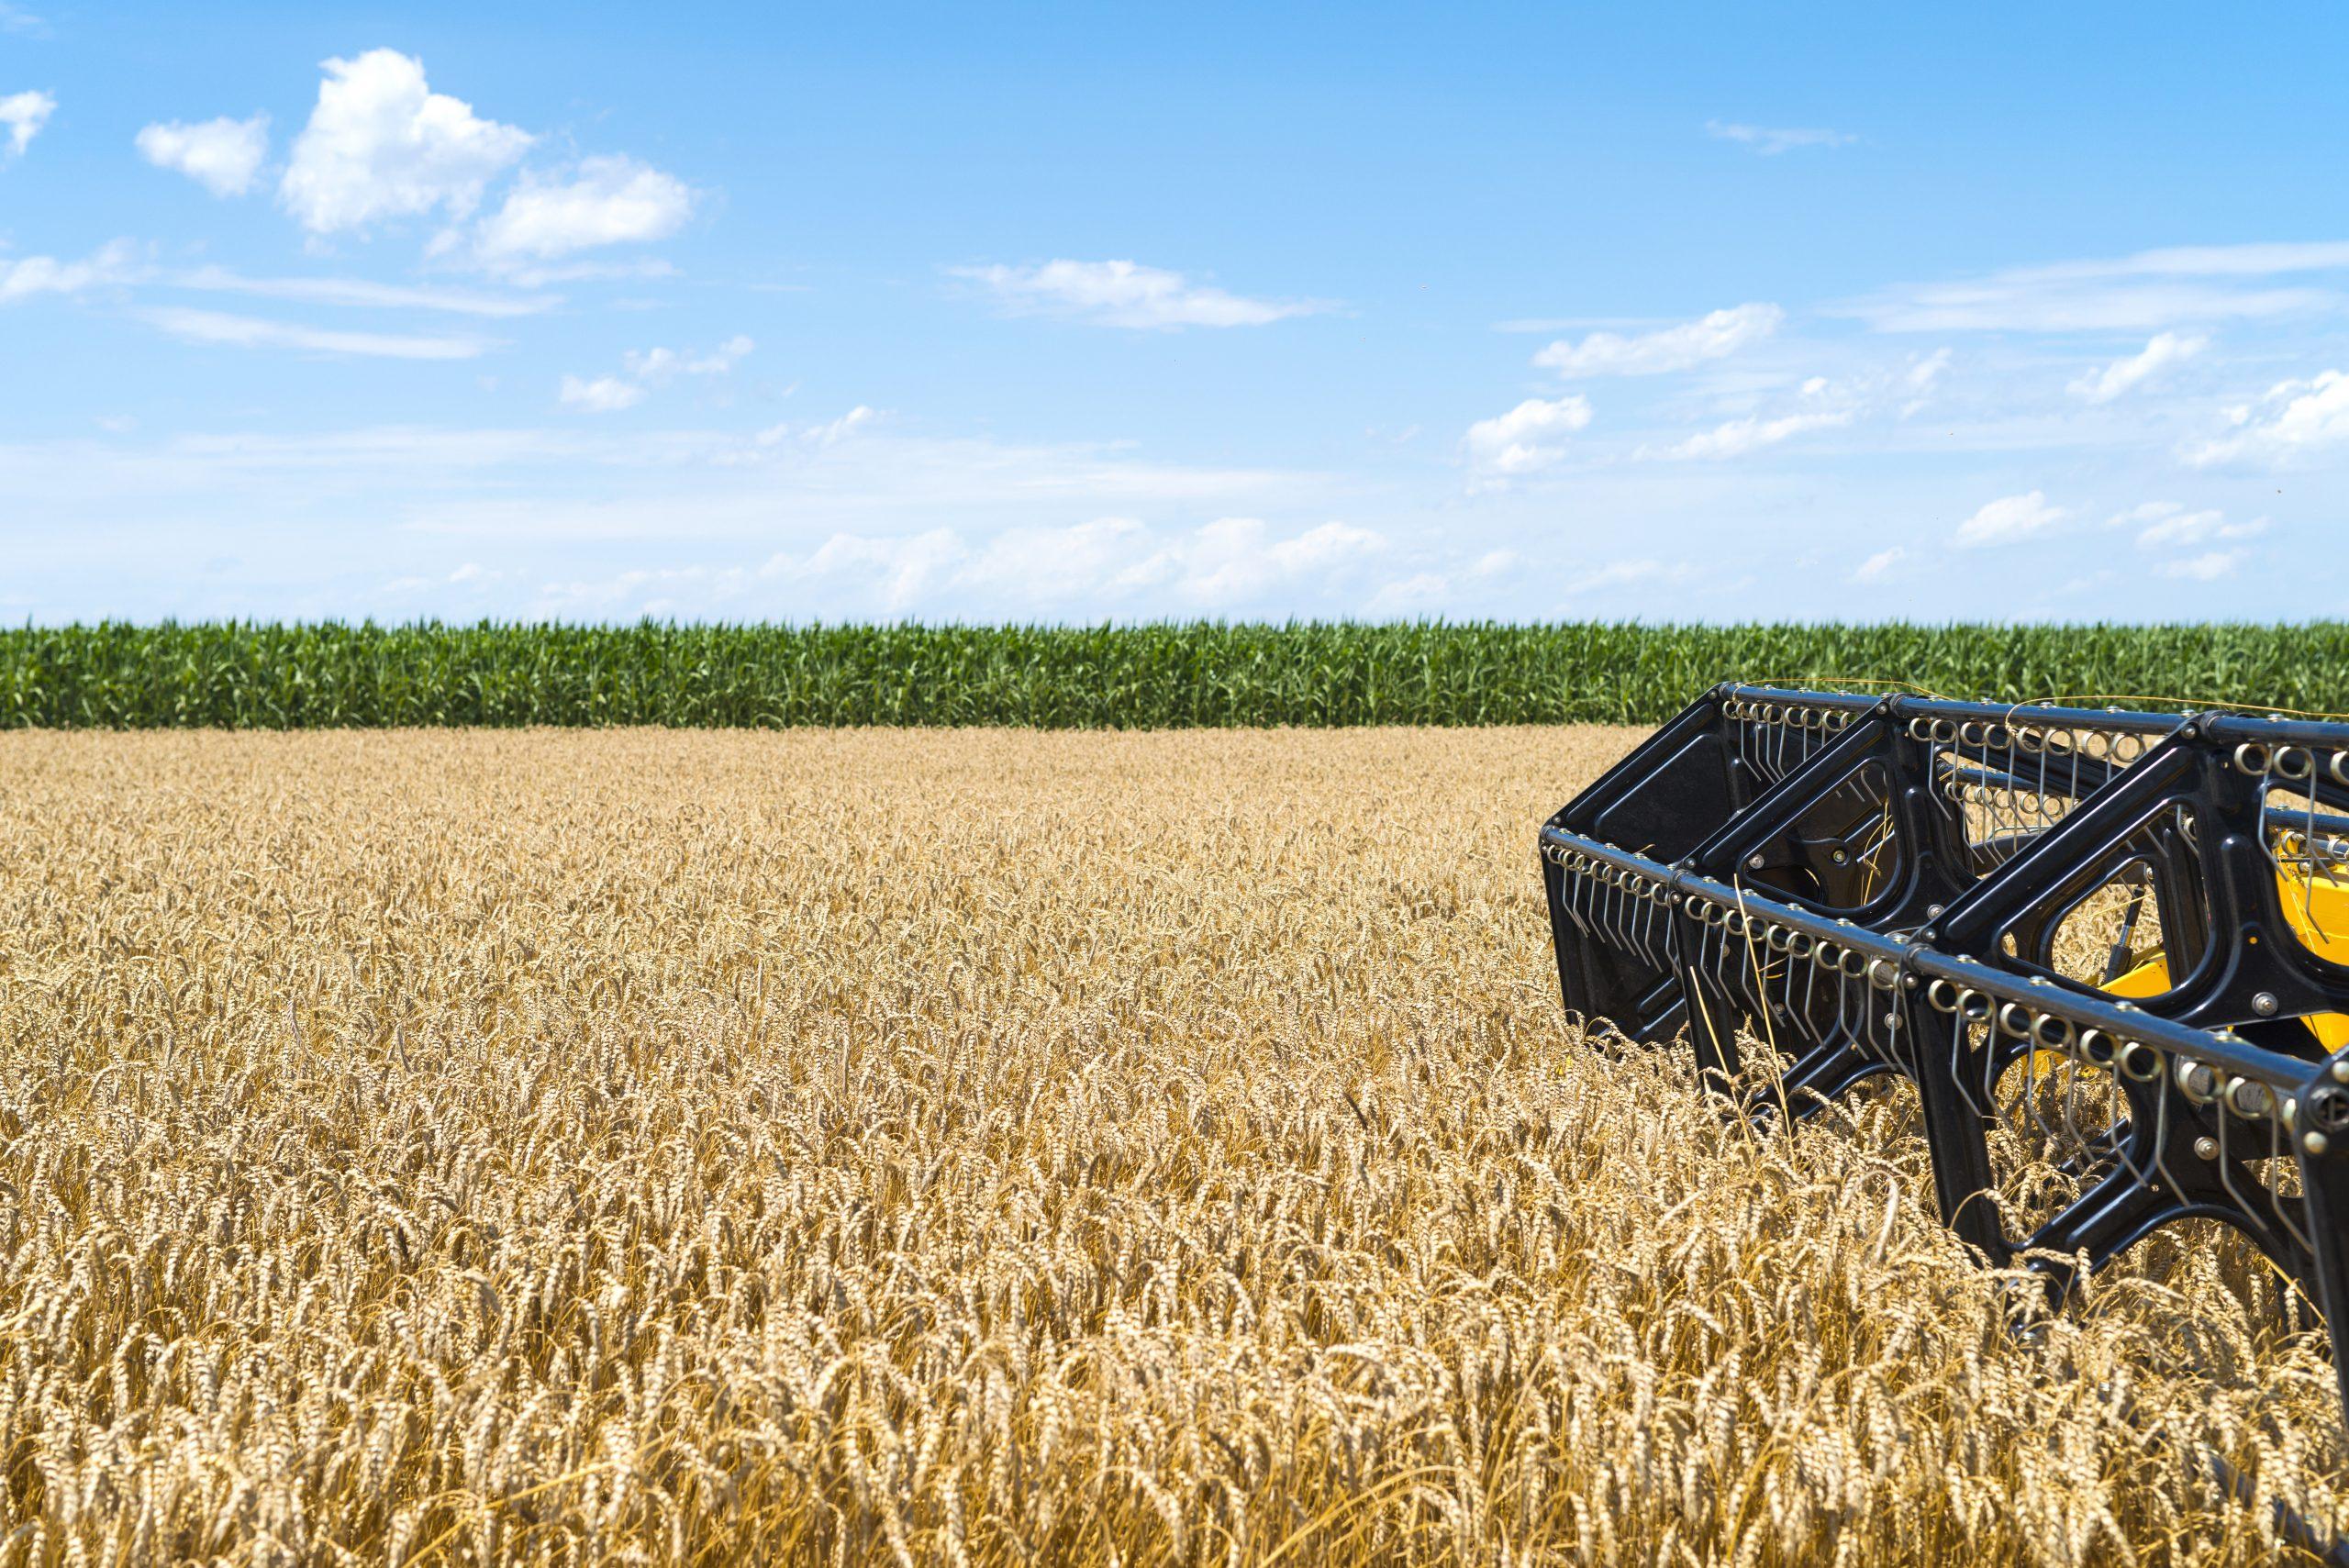 Combine harvester working in the field.